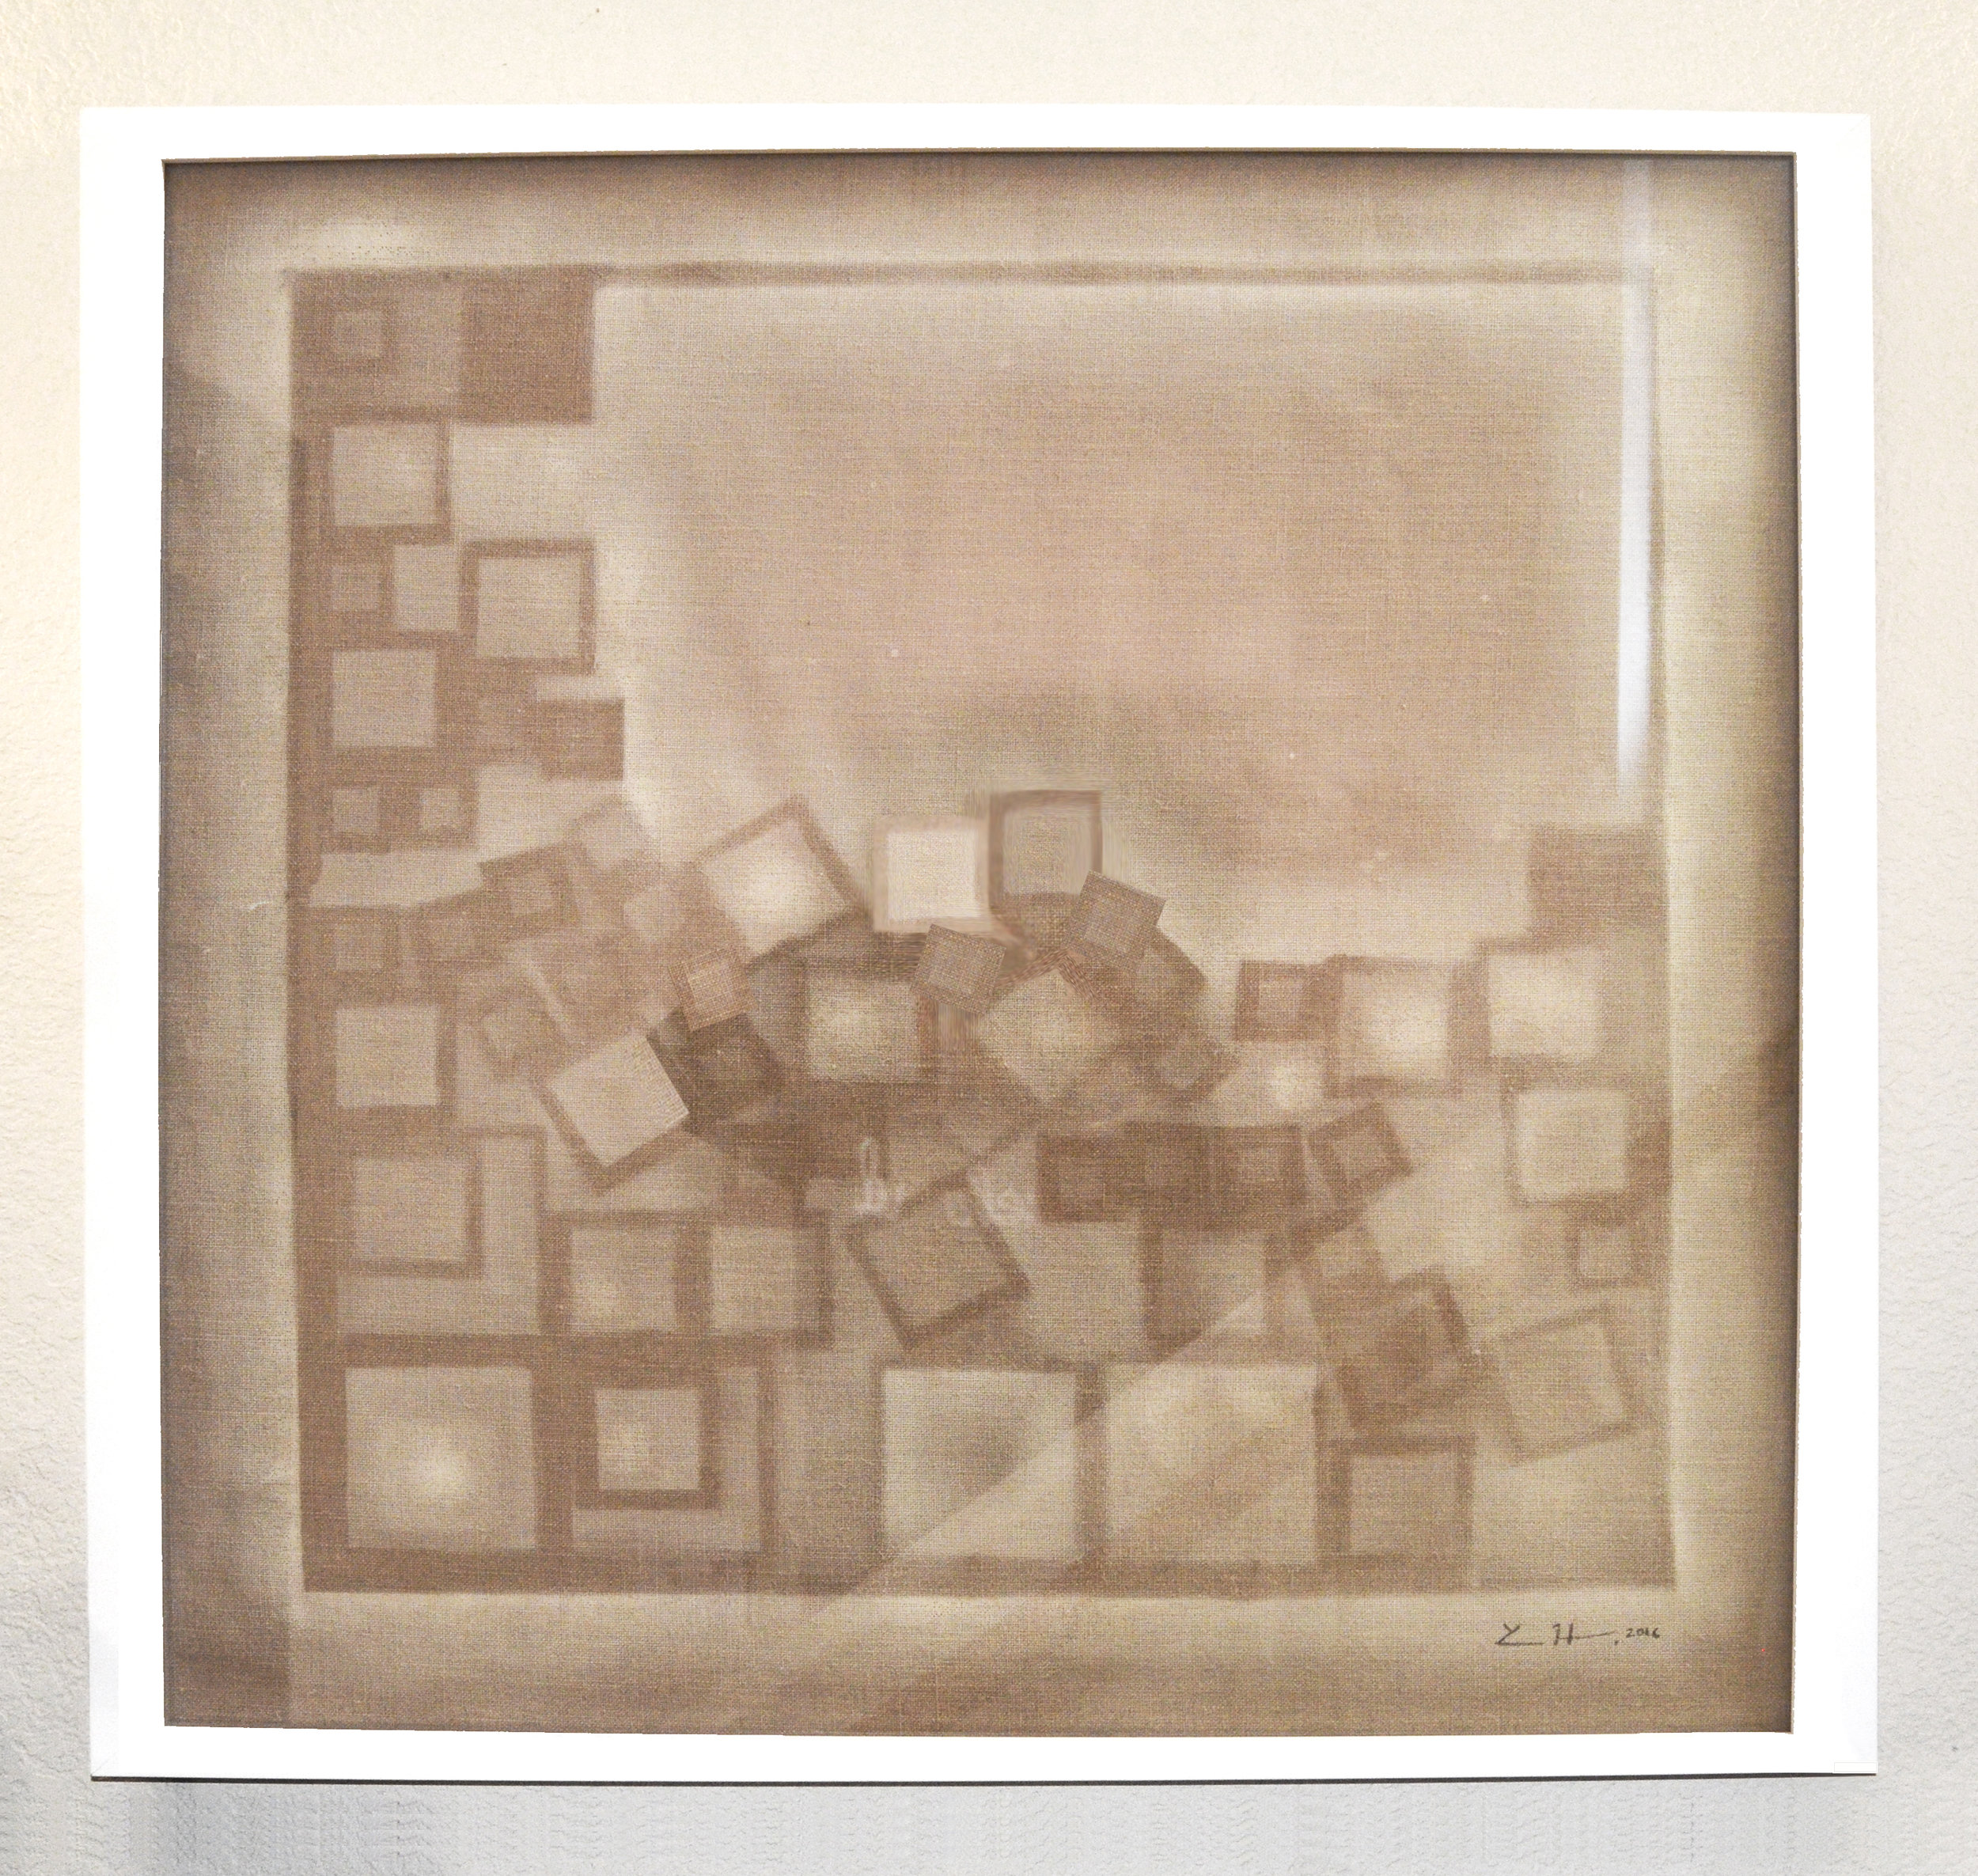 "Impression on Linen  acrylic on linen  30"" x 30"" - framed"